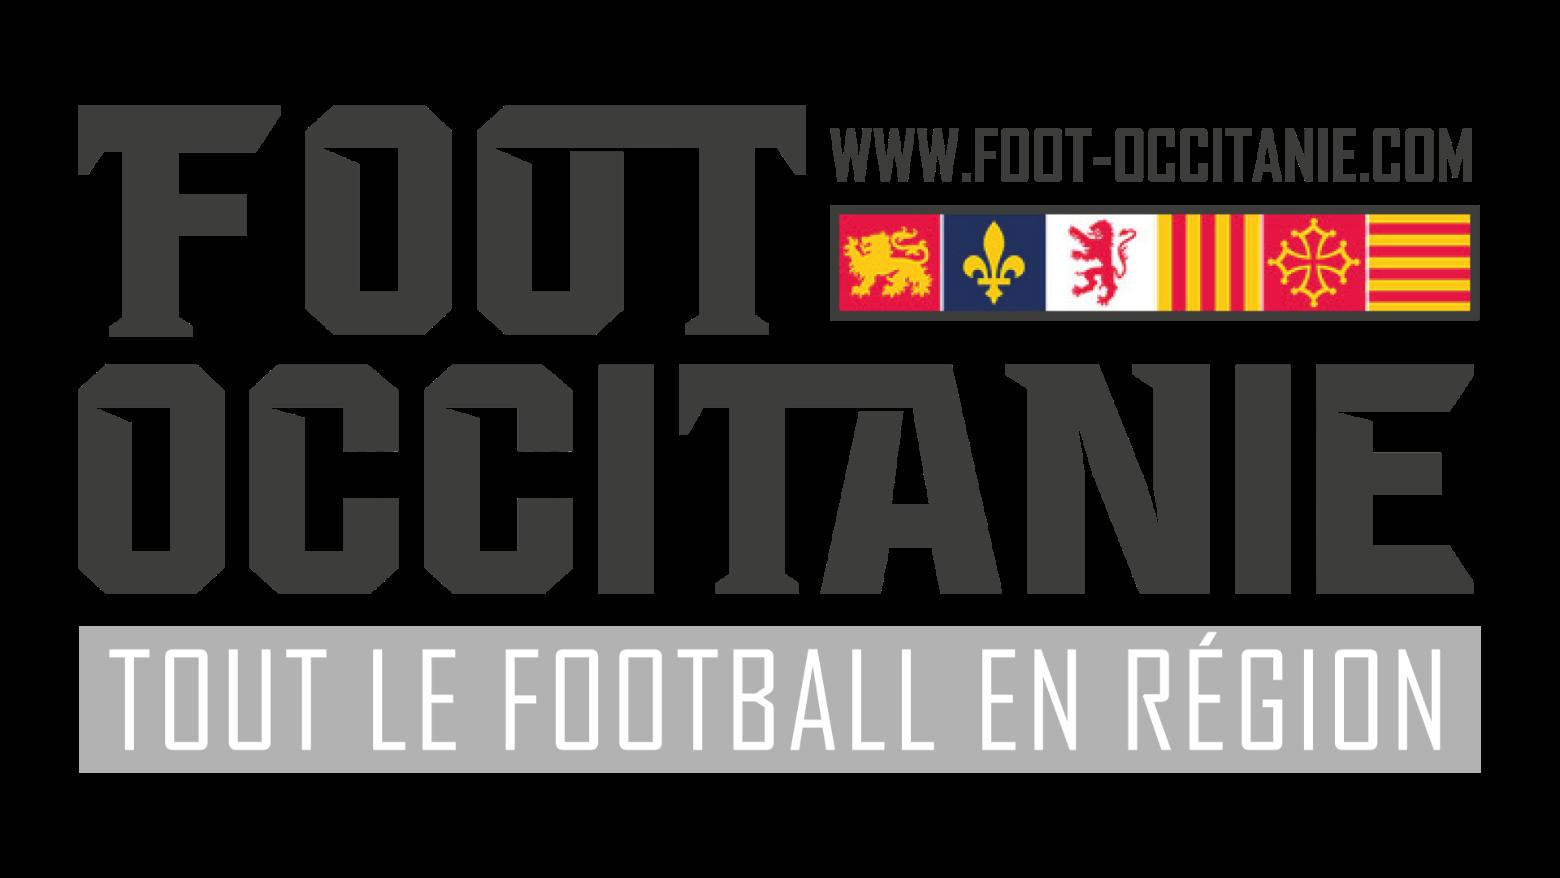 Foot-Occitanie.com - Tout le football en